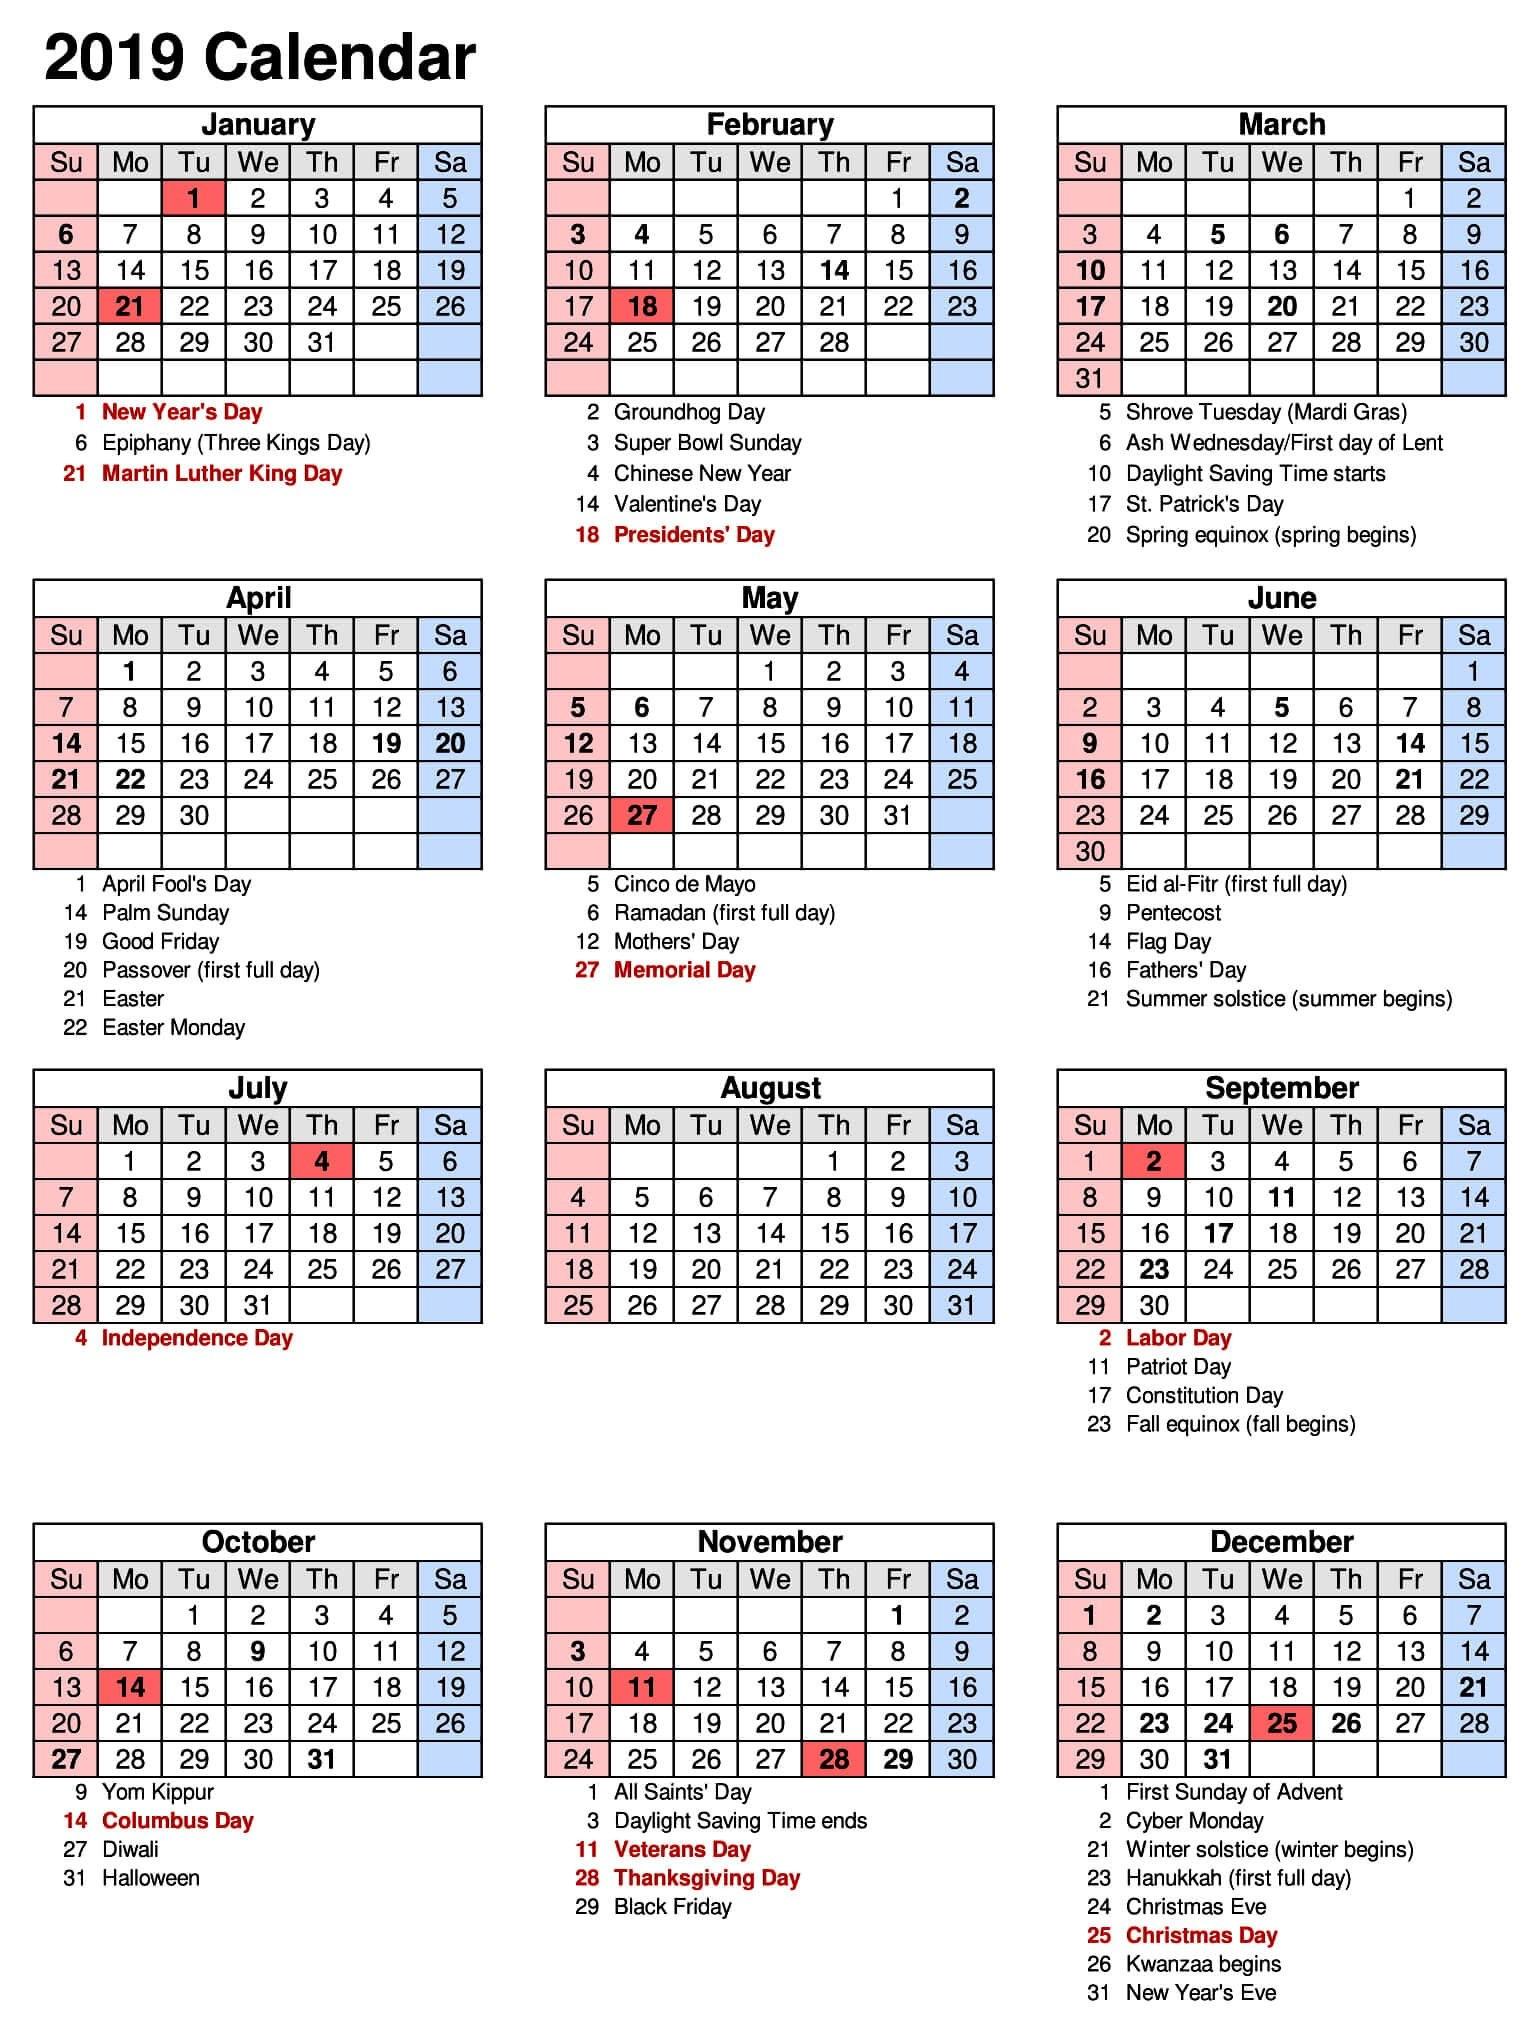 Printable Full Year Calendar 2019 Staples – 2018 Printable Calendar Calendar 2019 Staples